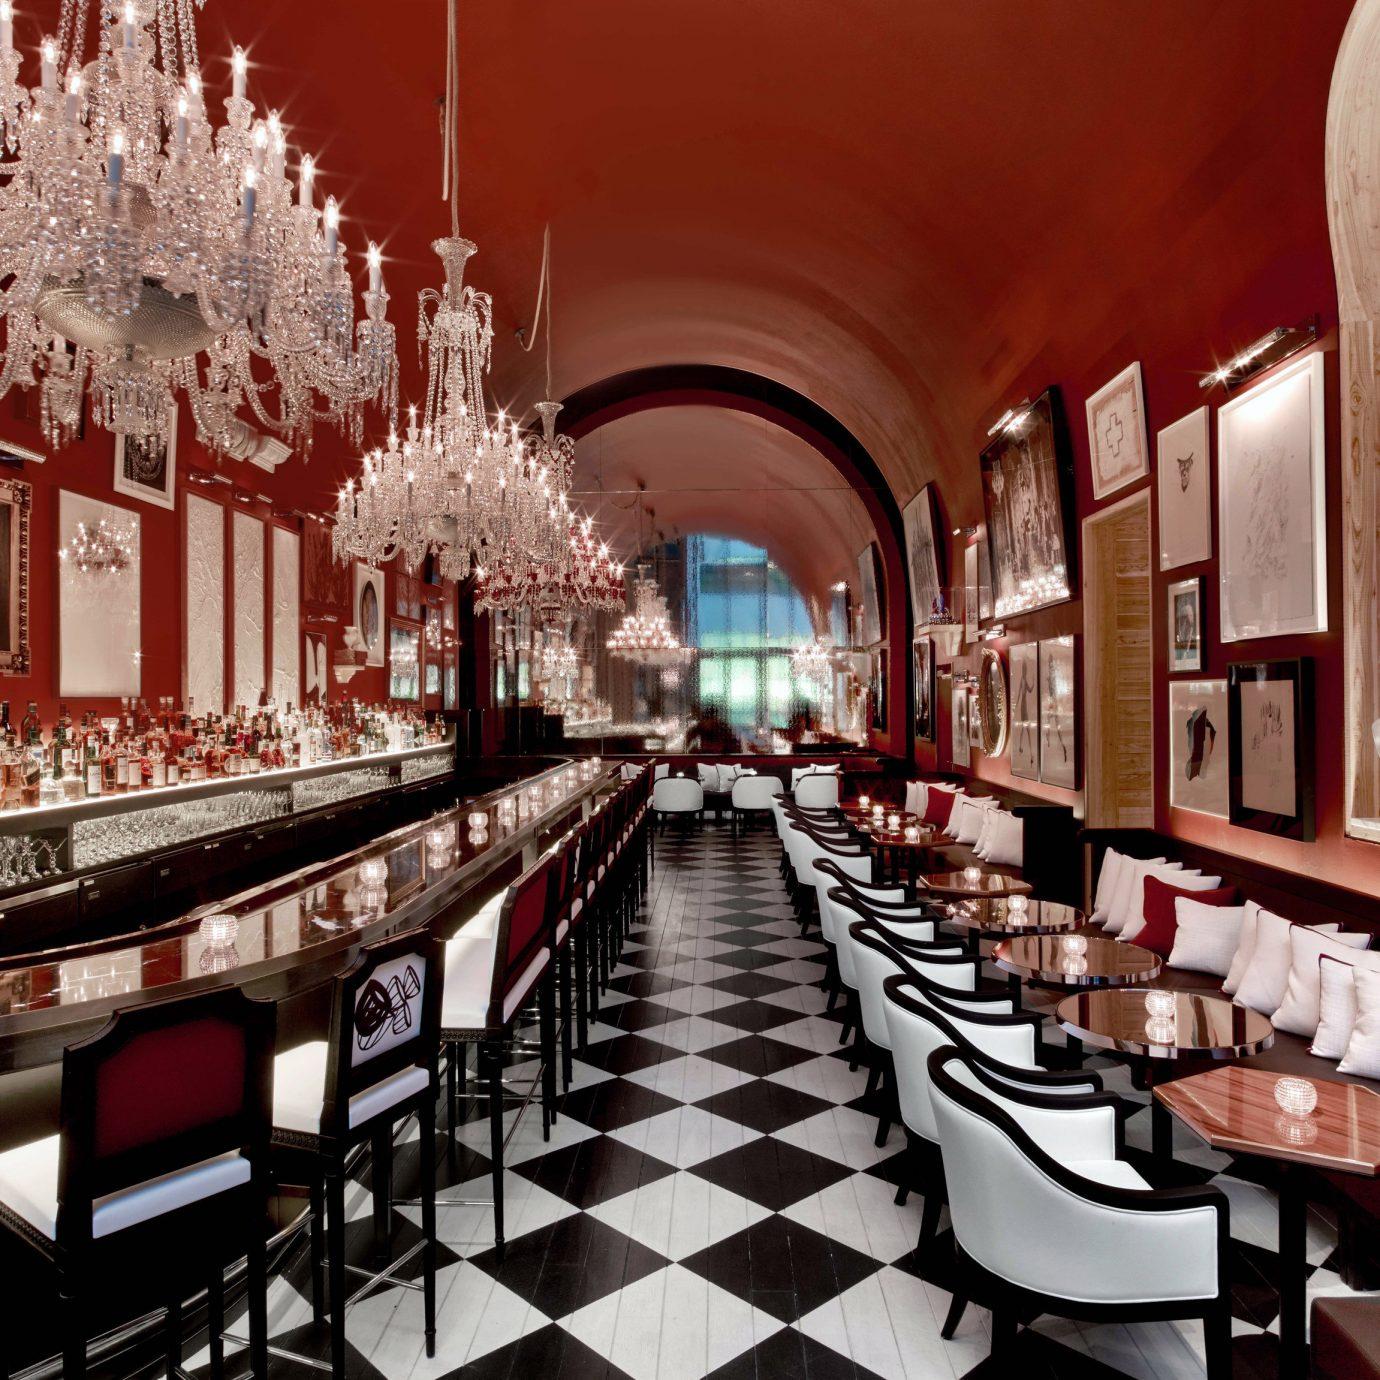 Hotels restaurant function hall Bar